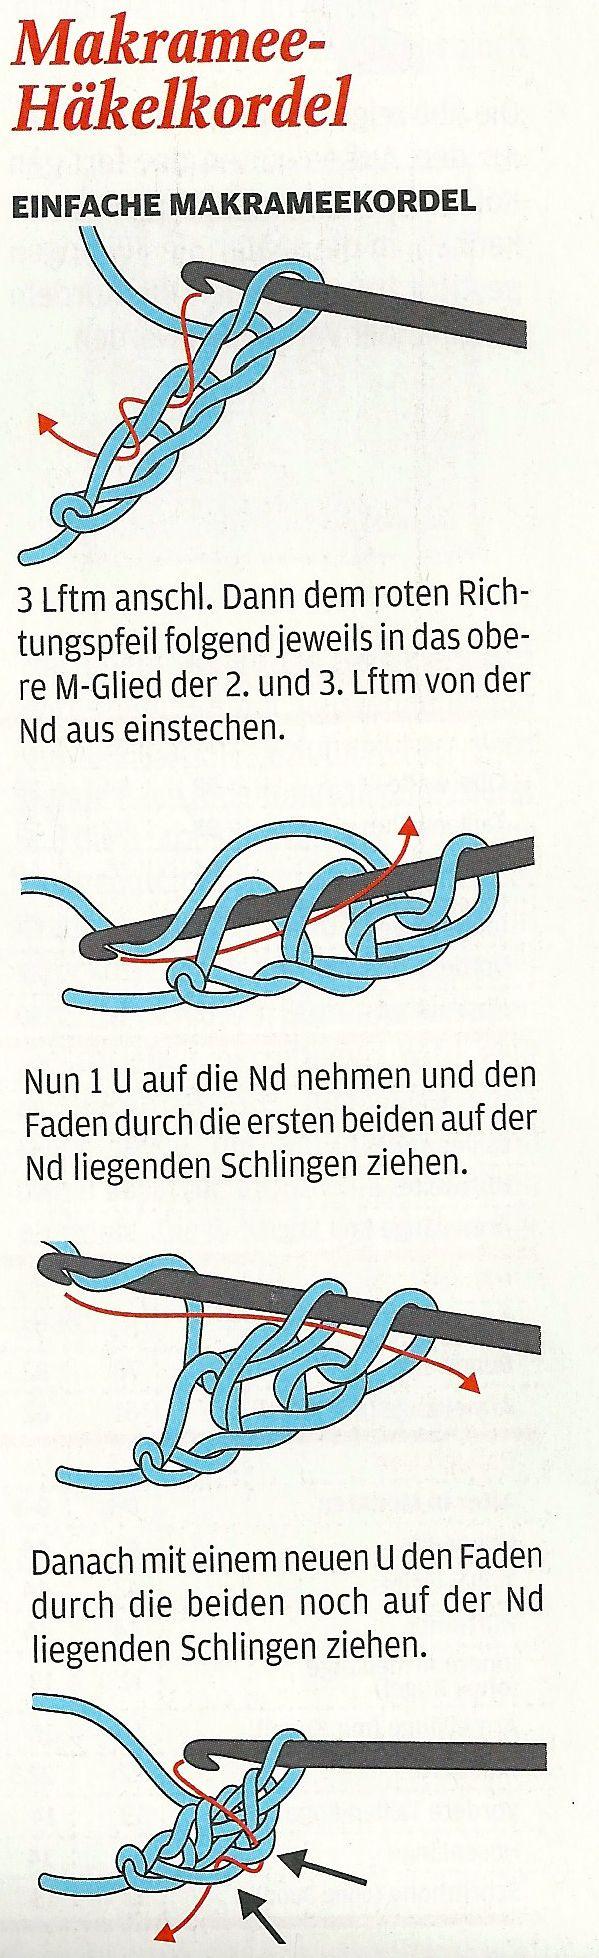 Makramee-Häkelkordel (basic Romanian Point Lace crochet cord instructions) from Lena magazine, September 2011